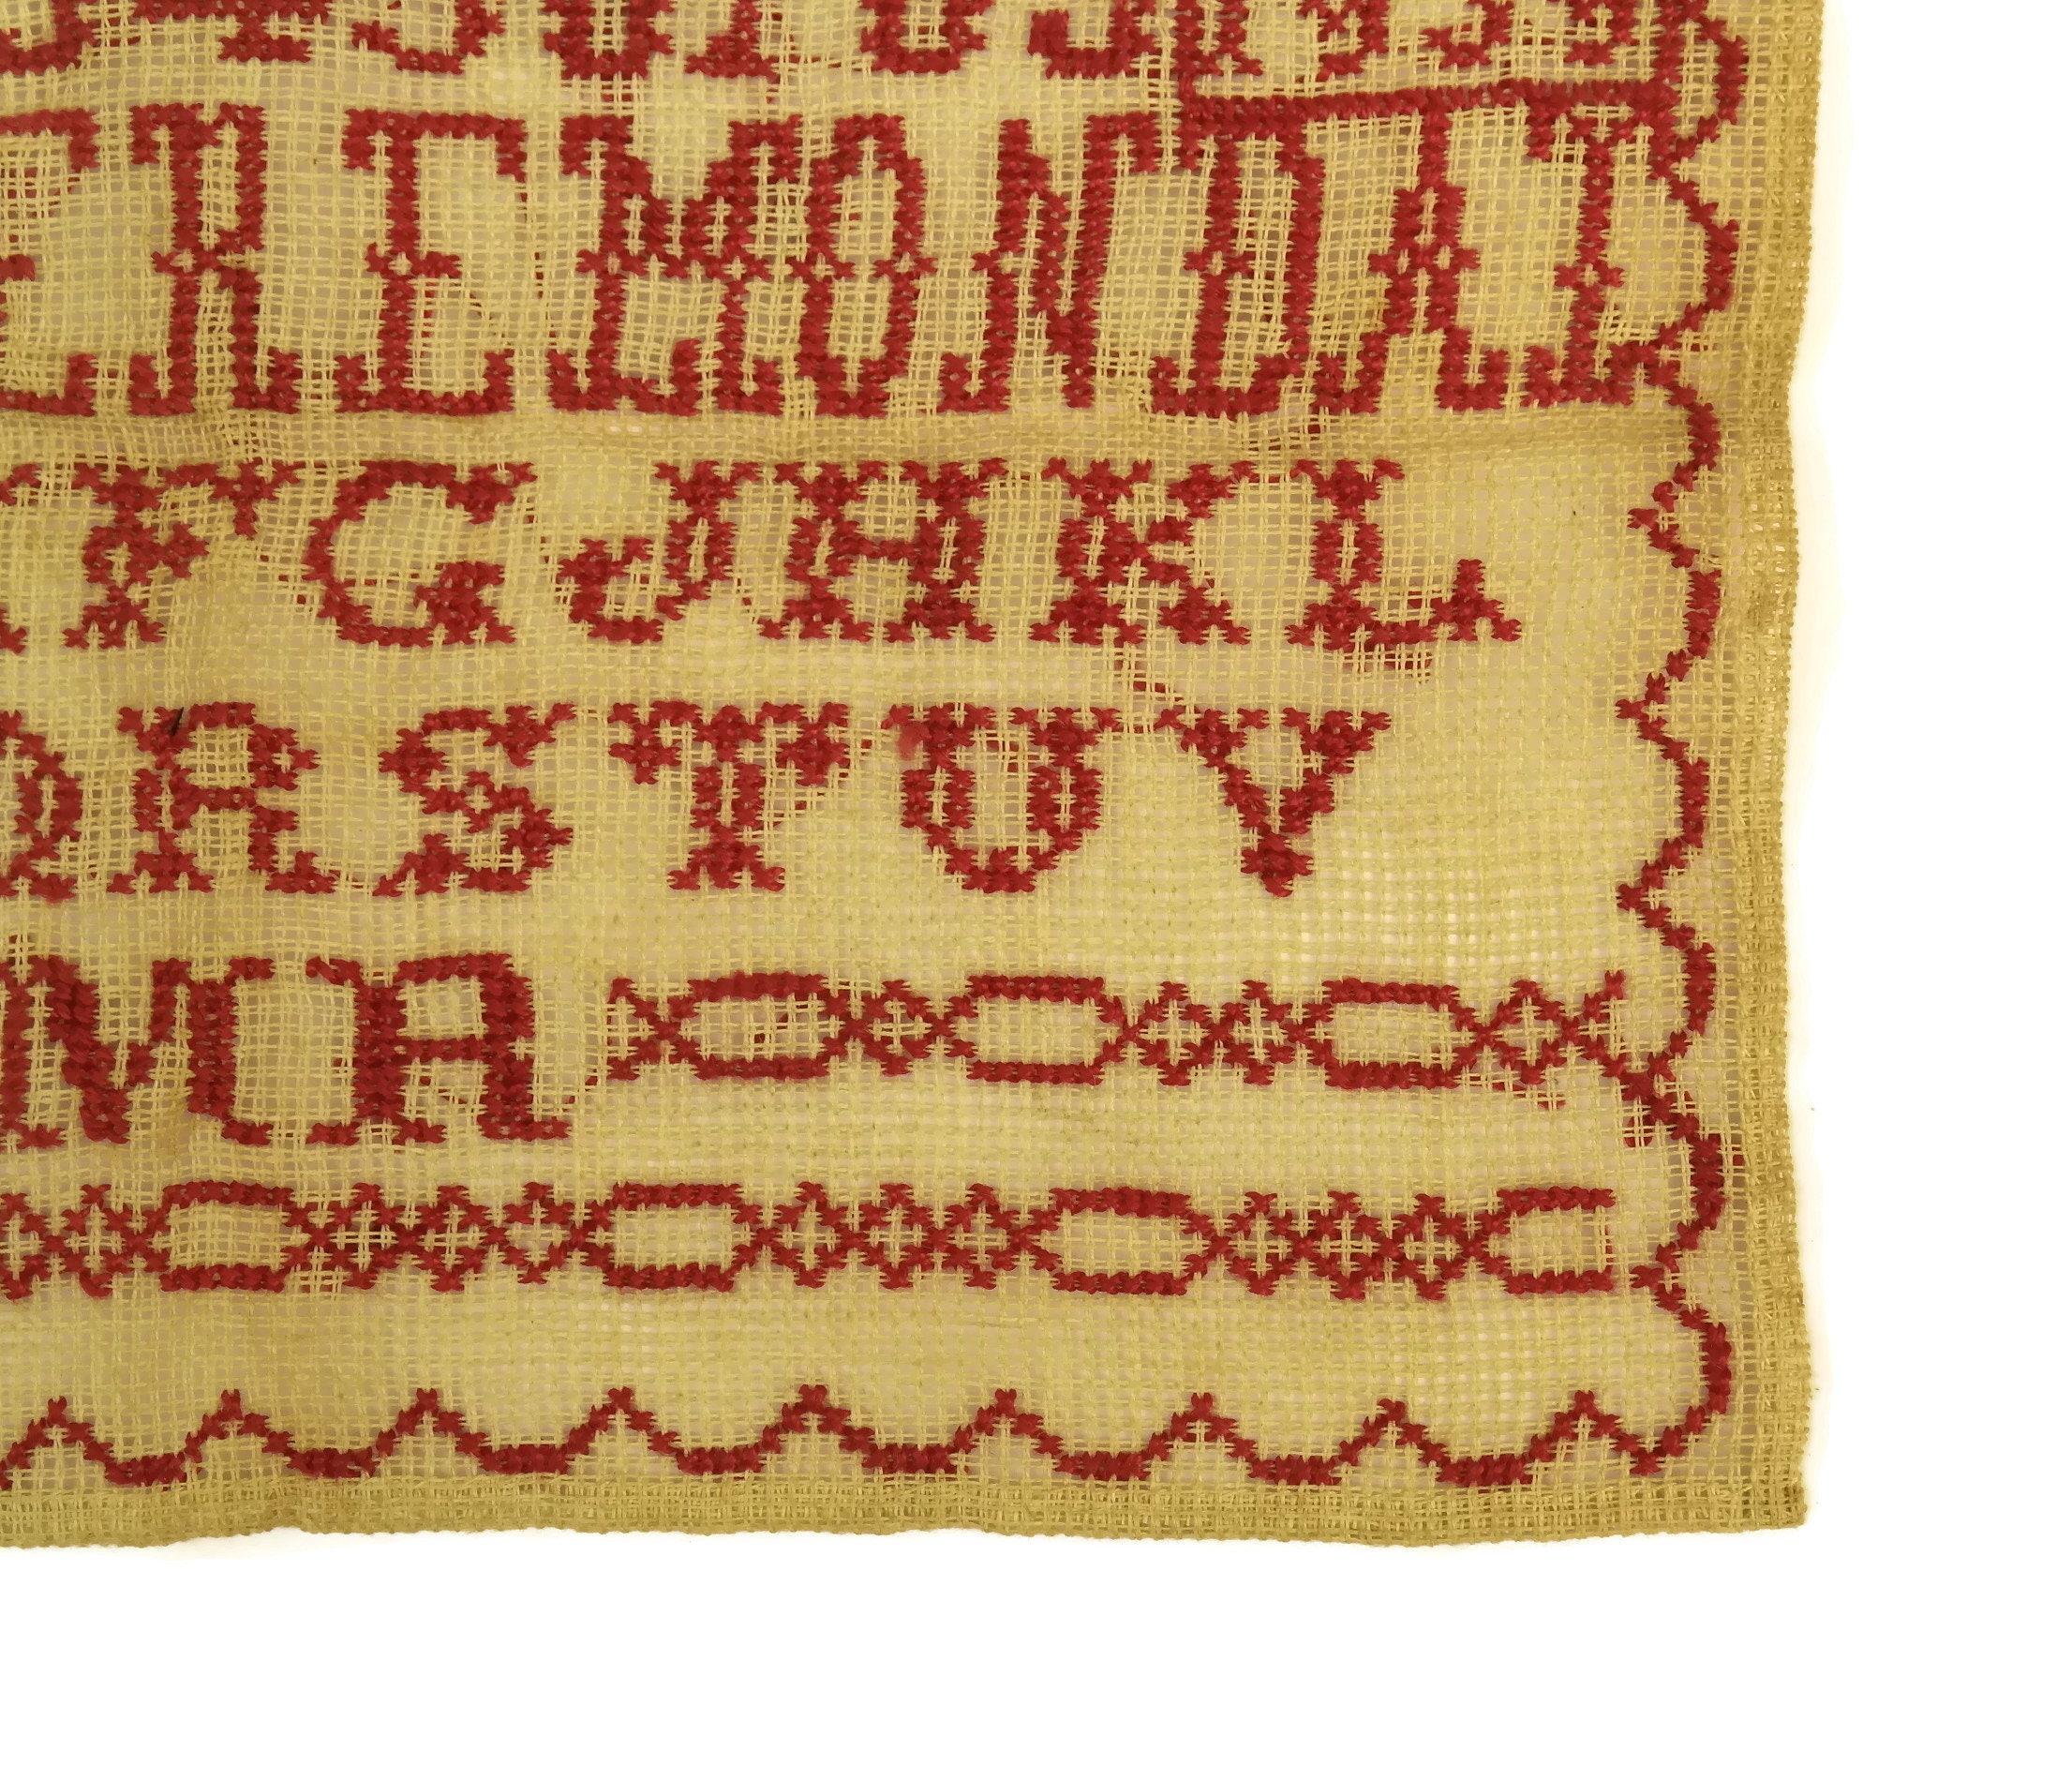 French Redwork Sampler. Antique Cross Stitch Alphabet and Number ...